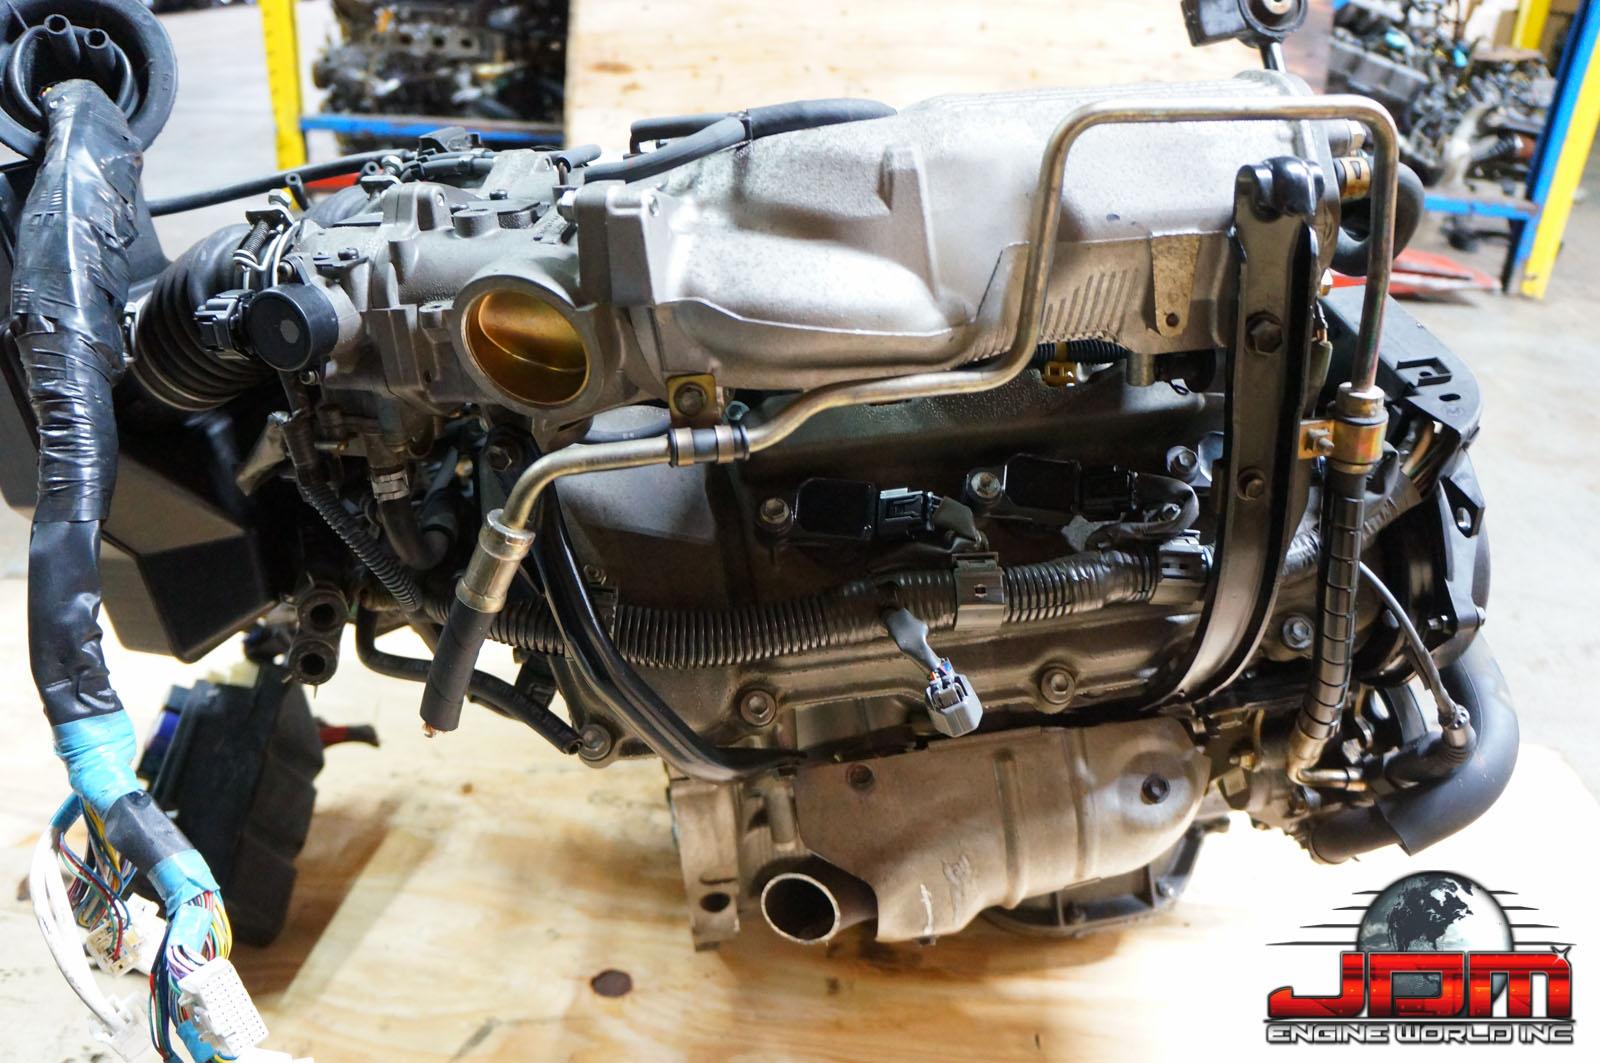 98 99 00 01 02 03 LEXUS RX300 1MZ-FE ENGINE 3.0L V6 VVTi FWD JDM 1MZ-FE